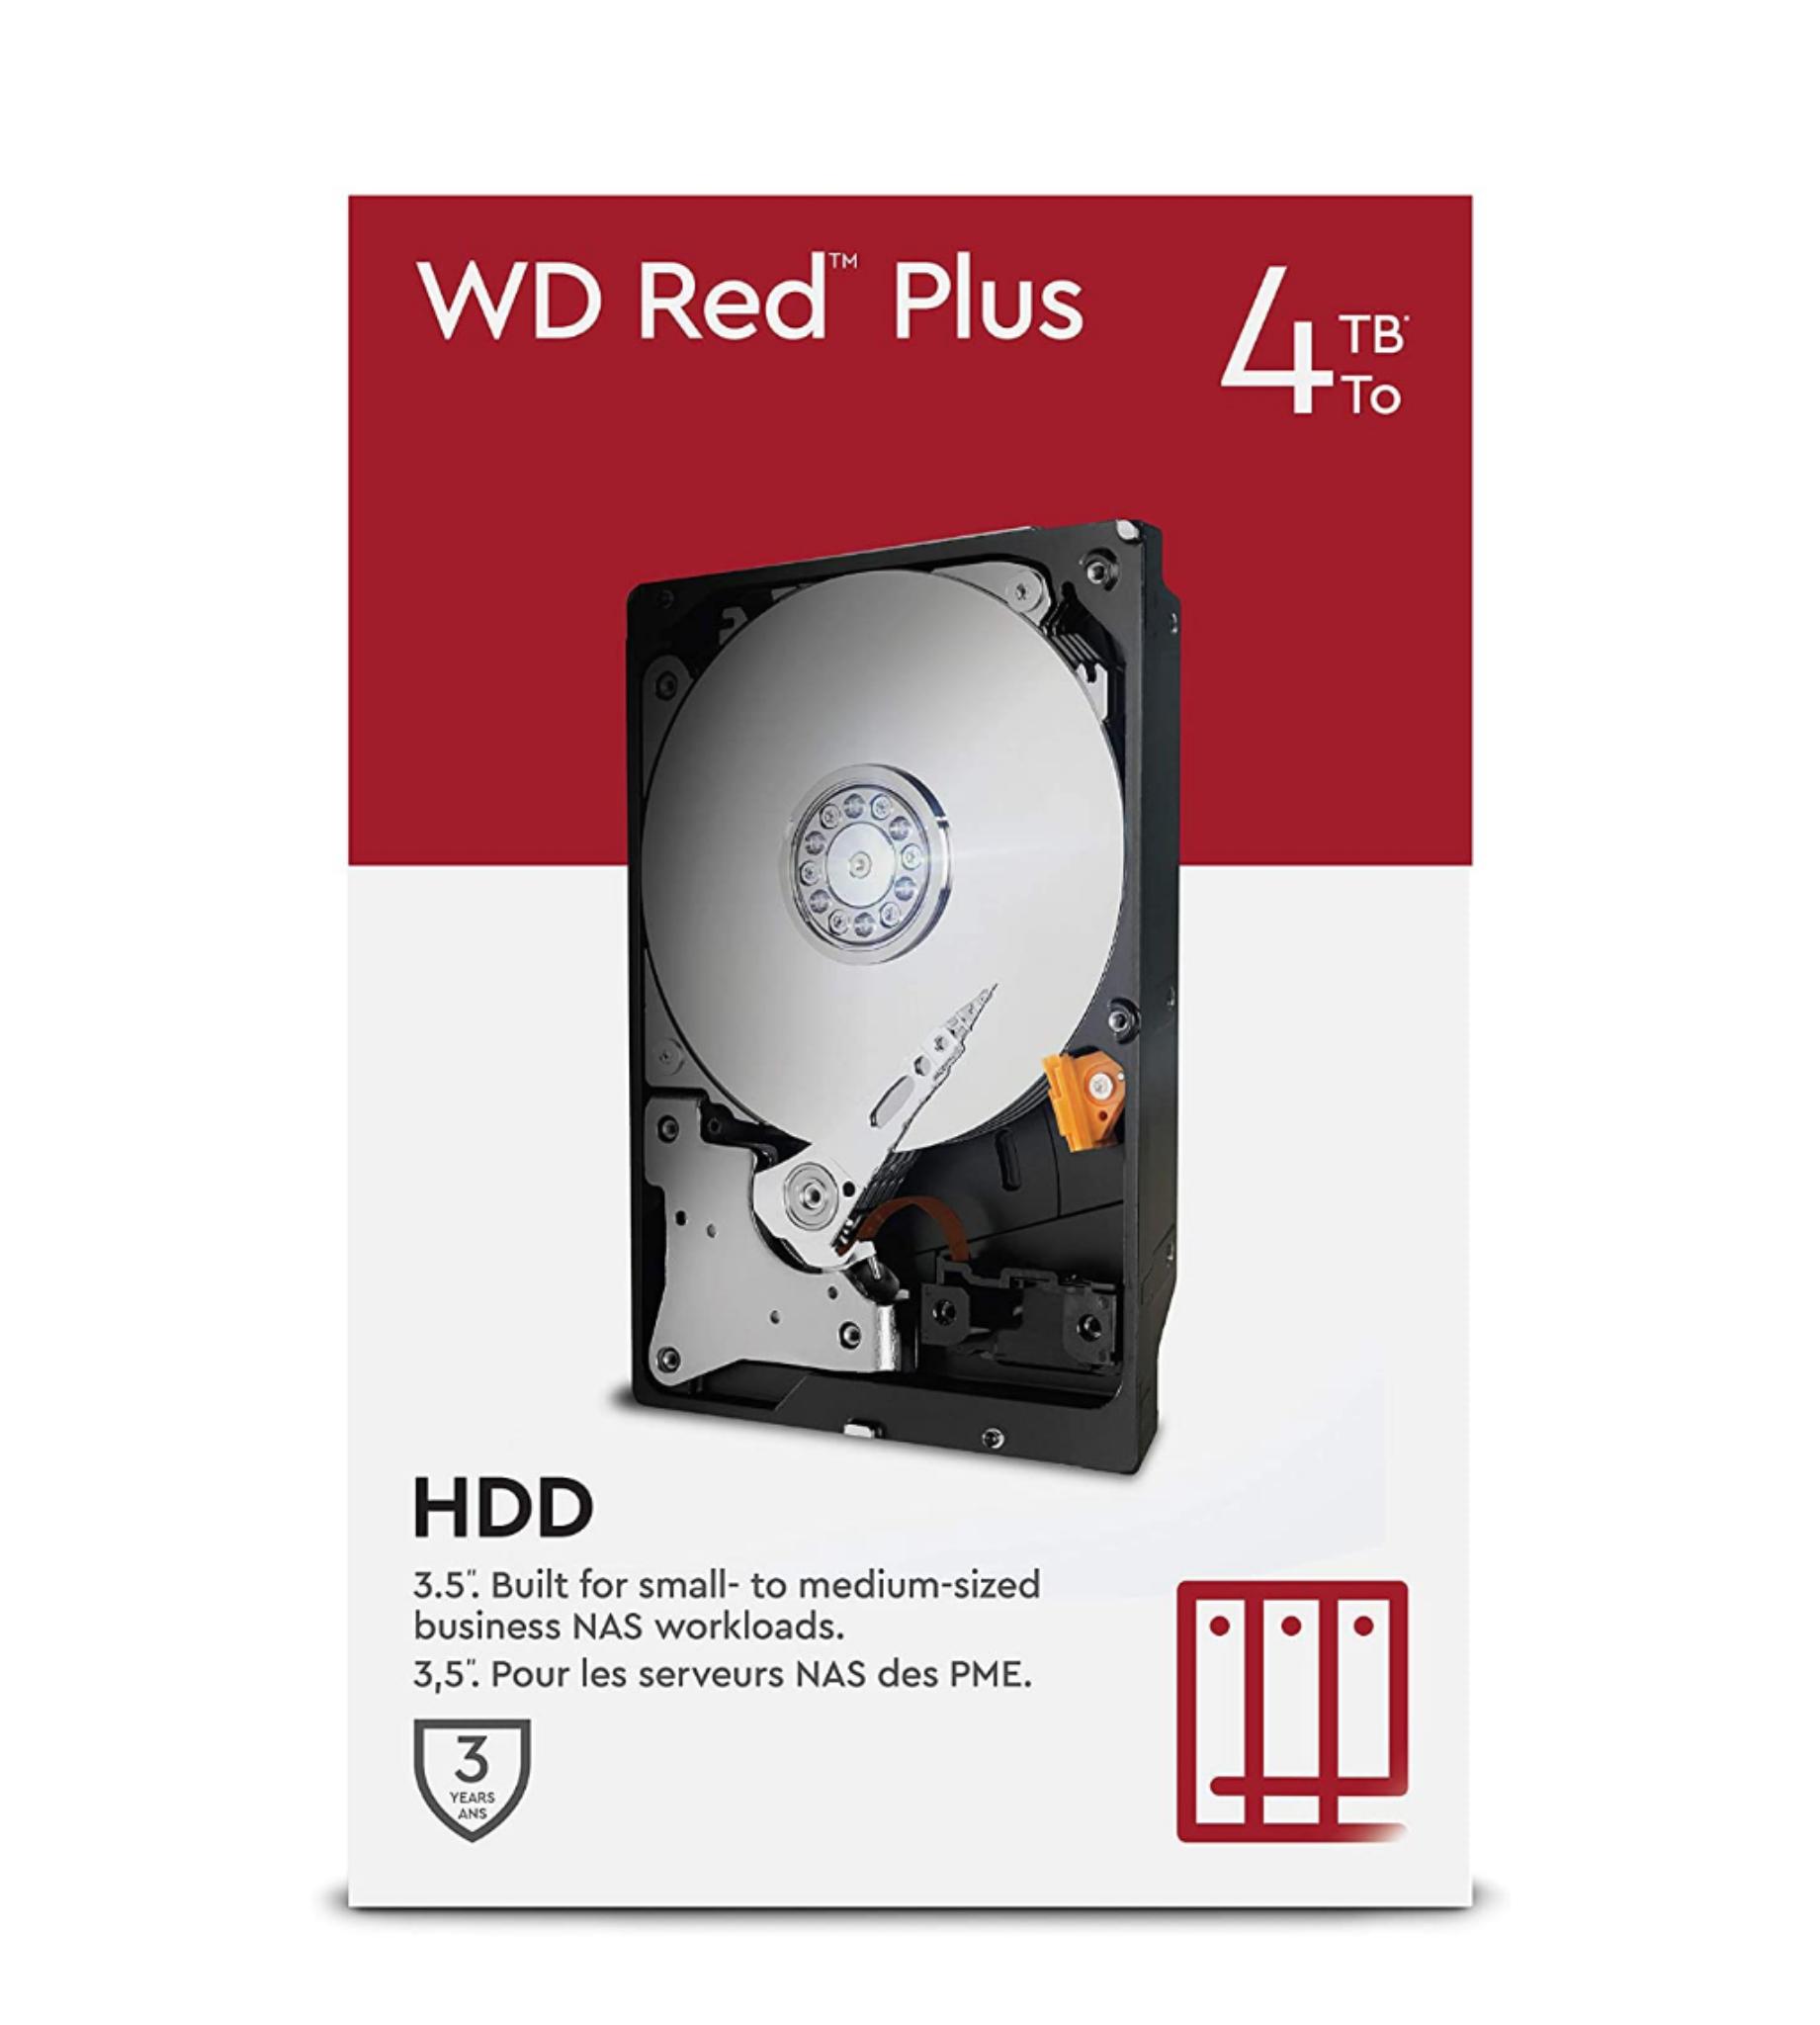 "WD Red Plus 4TB NAS 3.5"" Internal Hard Drive - 5400 RPM Class, SATA 6 Gb/s, CMR, 64MB Cache £92.99 @ Amazon"